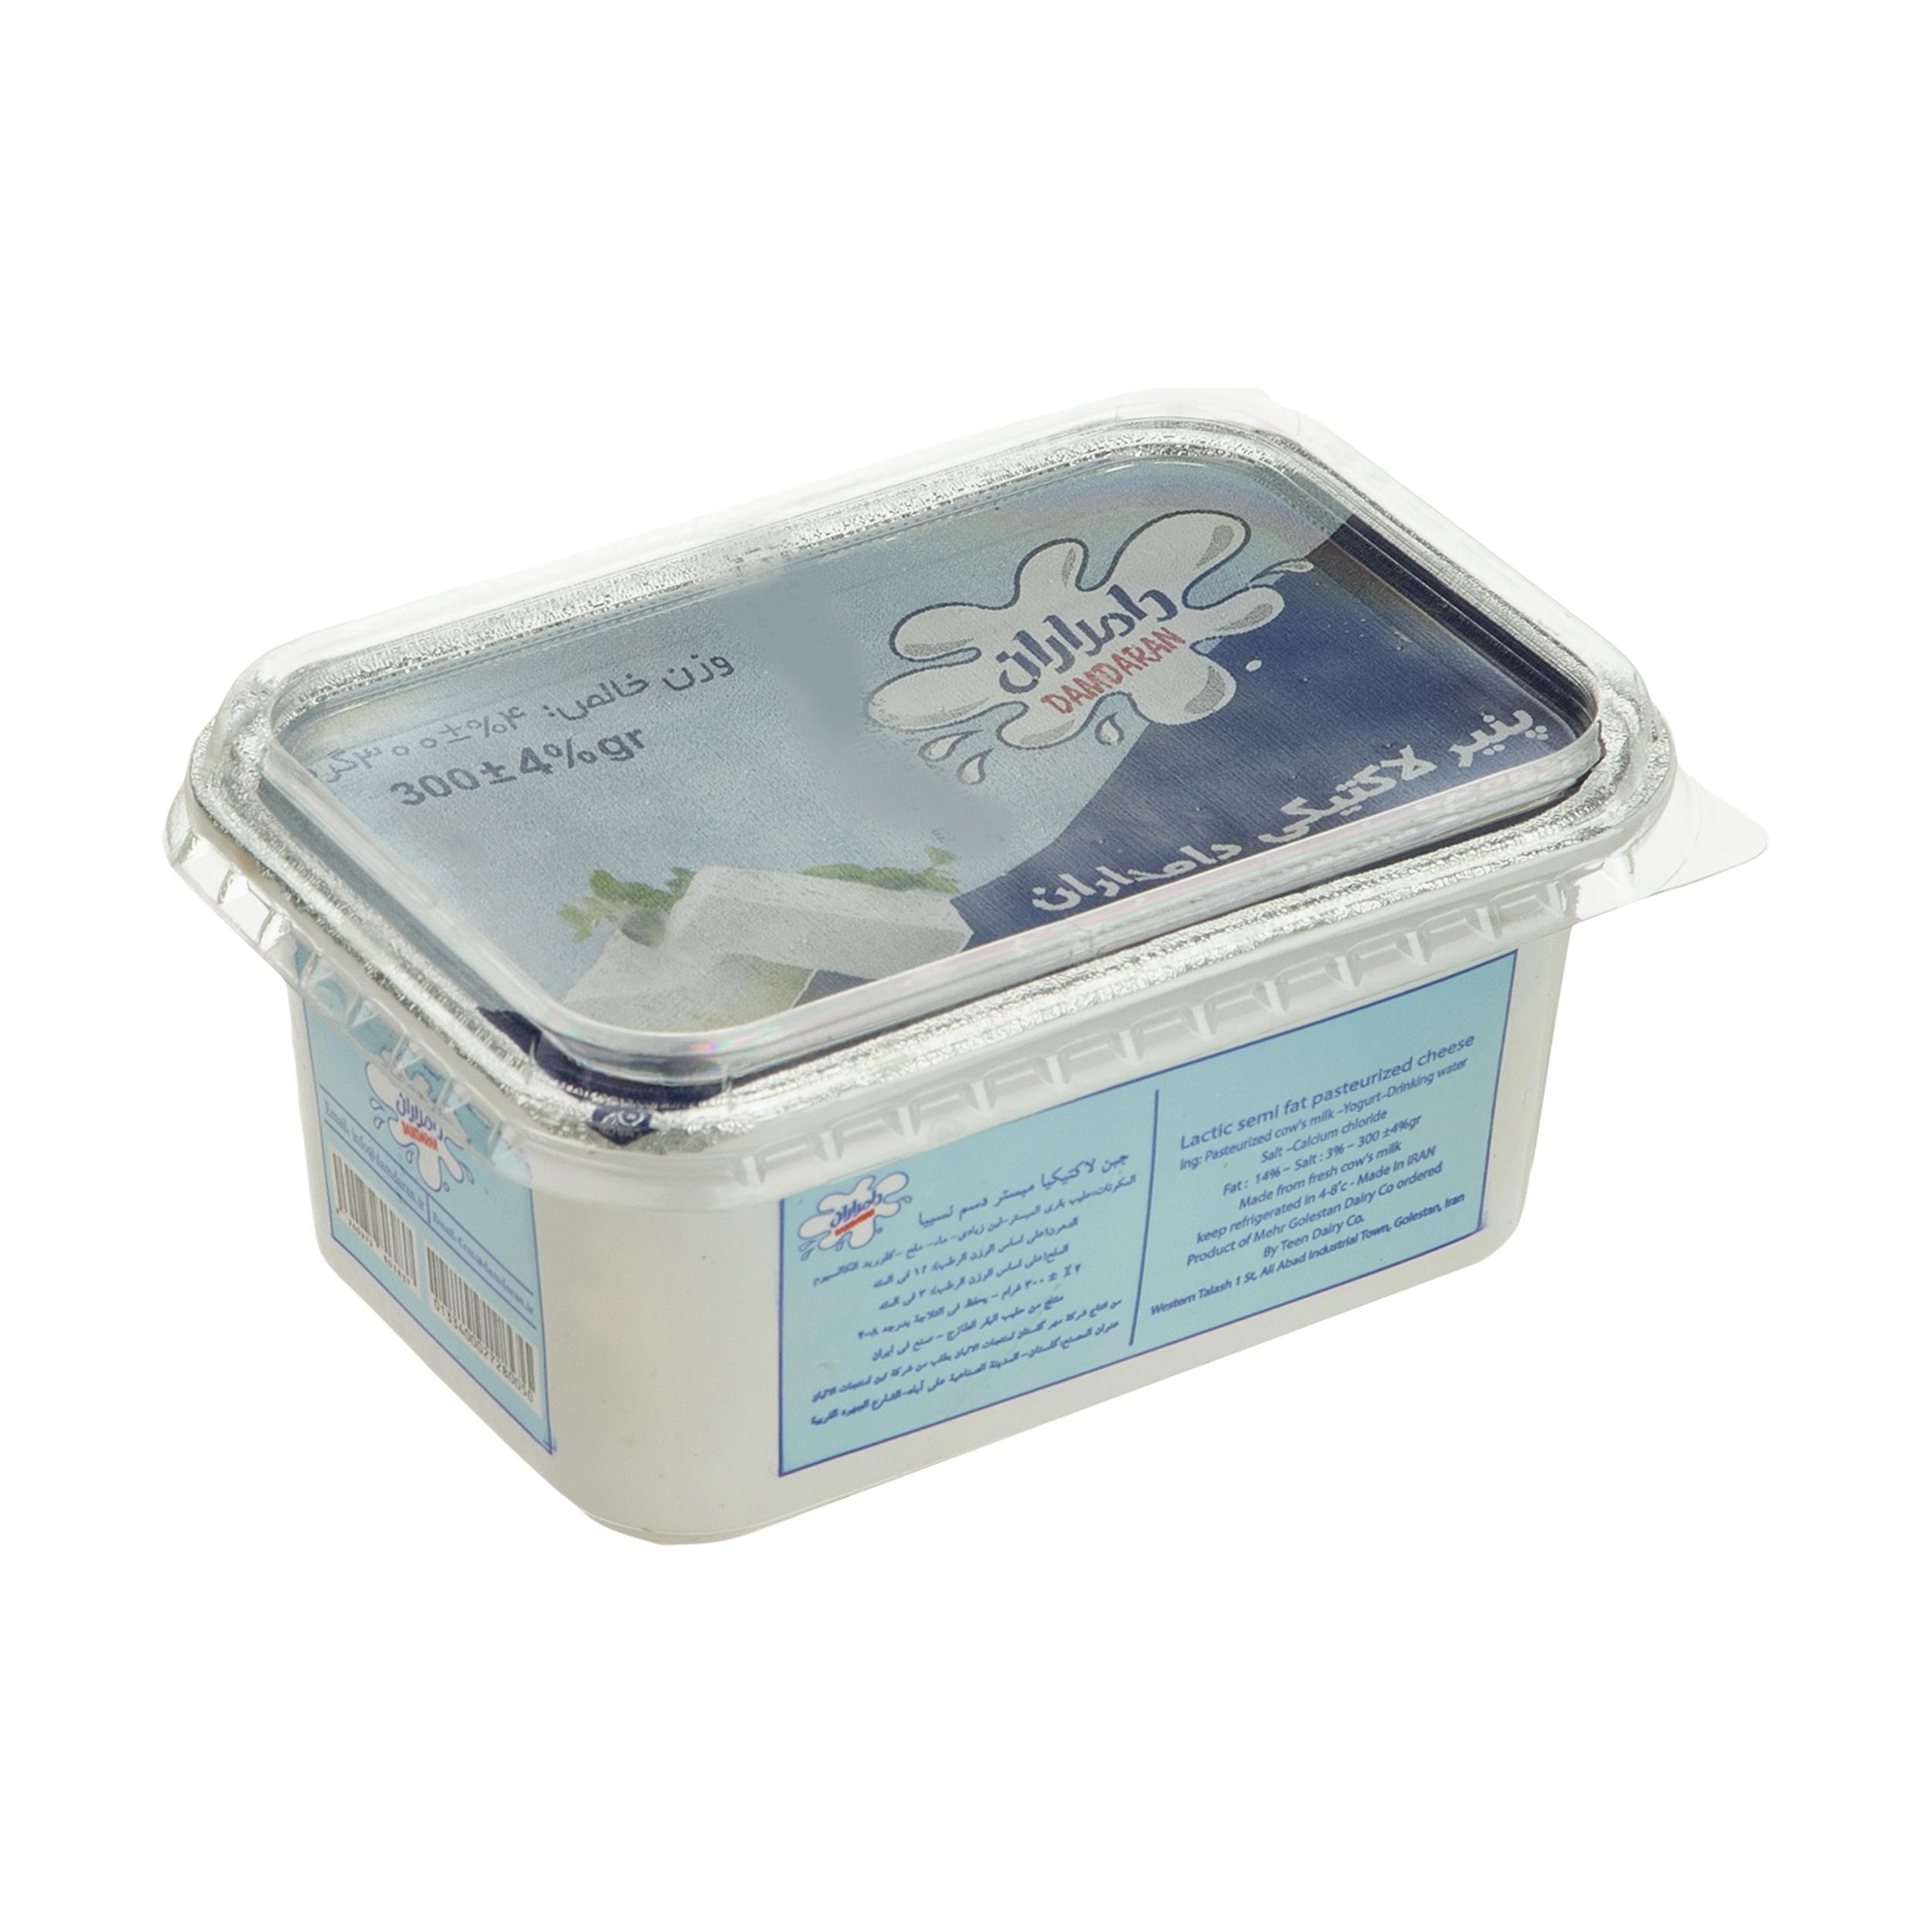 پنیر لاکتیکی دامداران  - 300 گرم